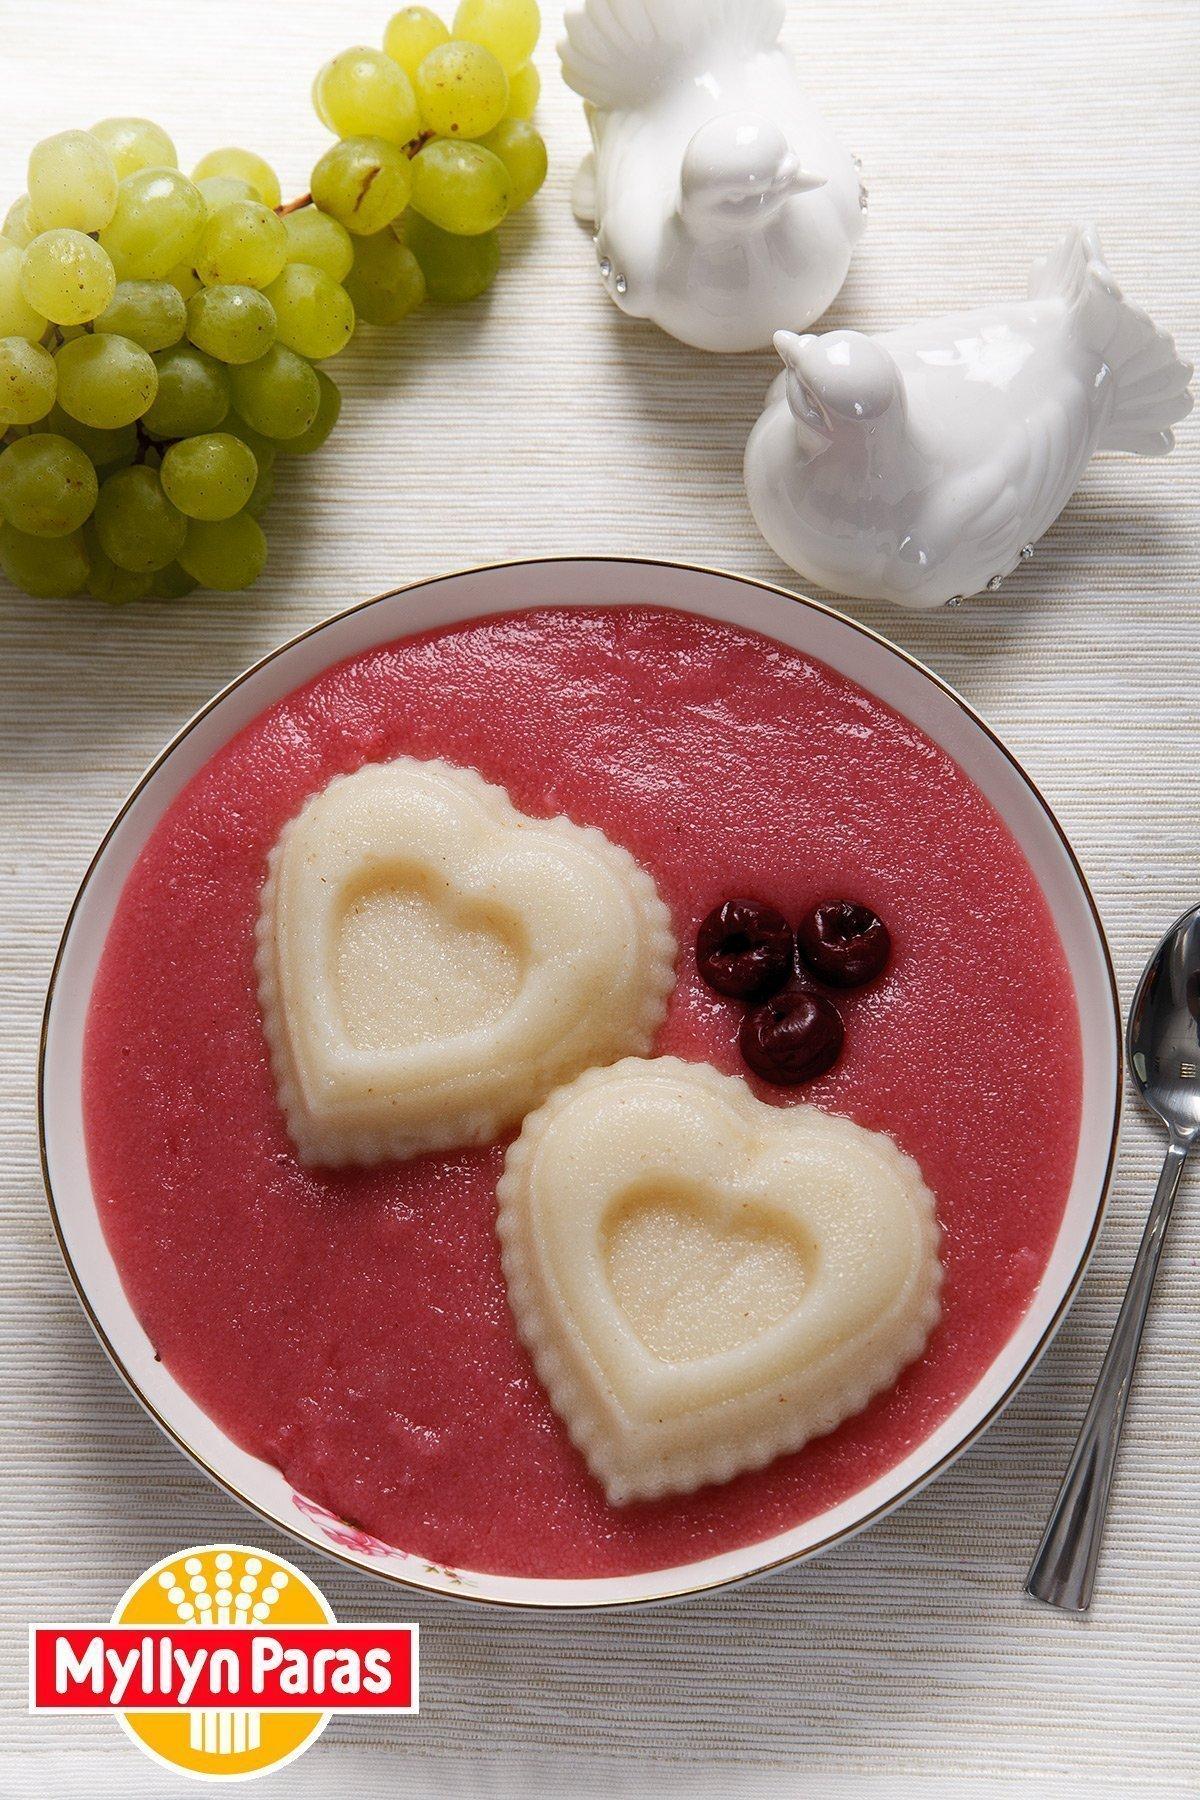 рецепт манной каши на молоке с вишнями